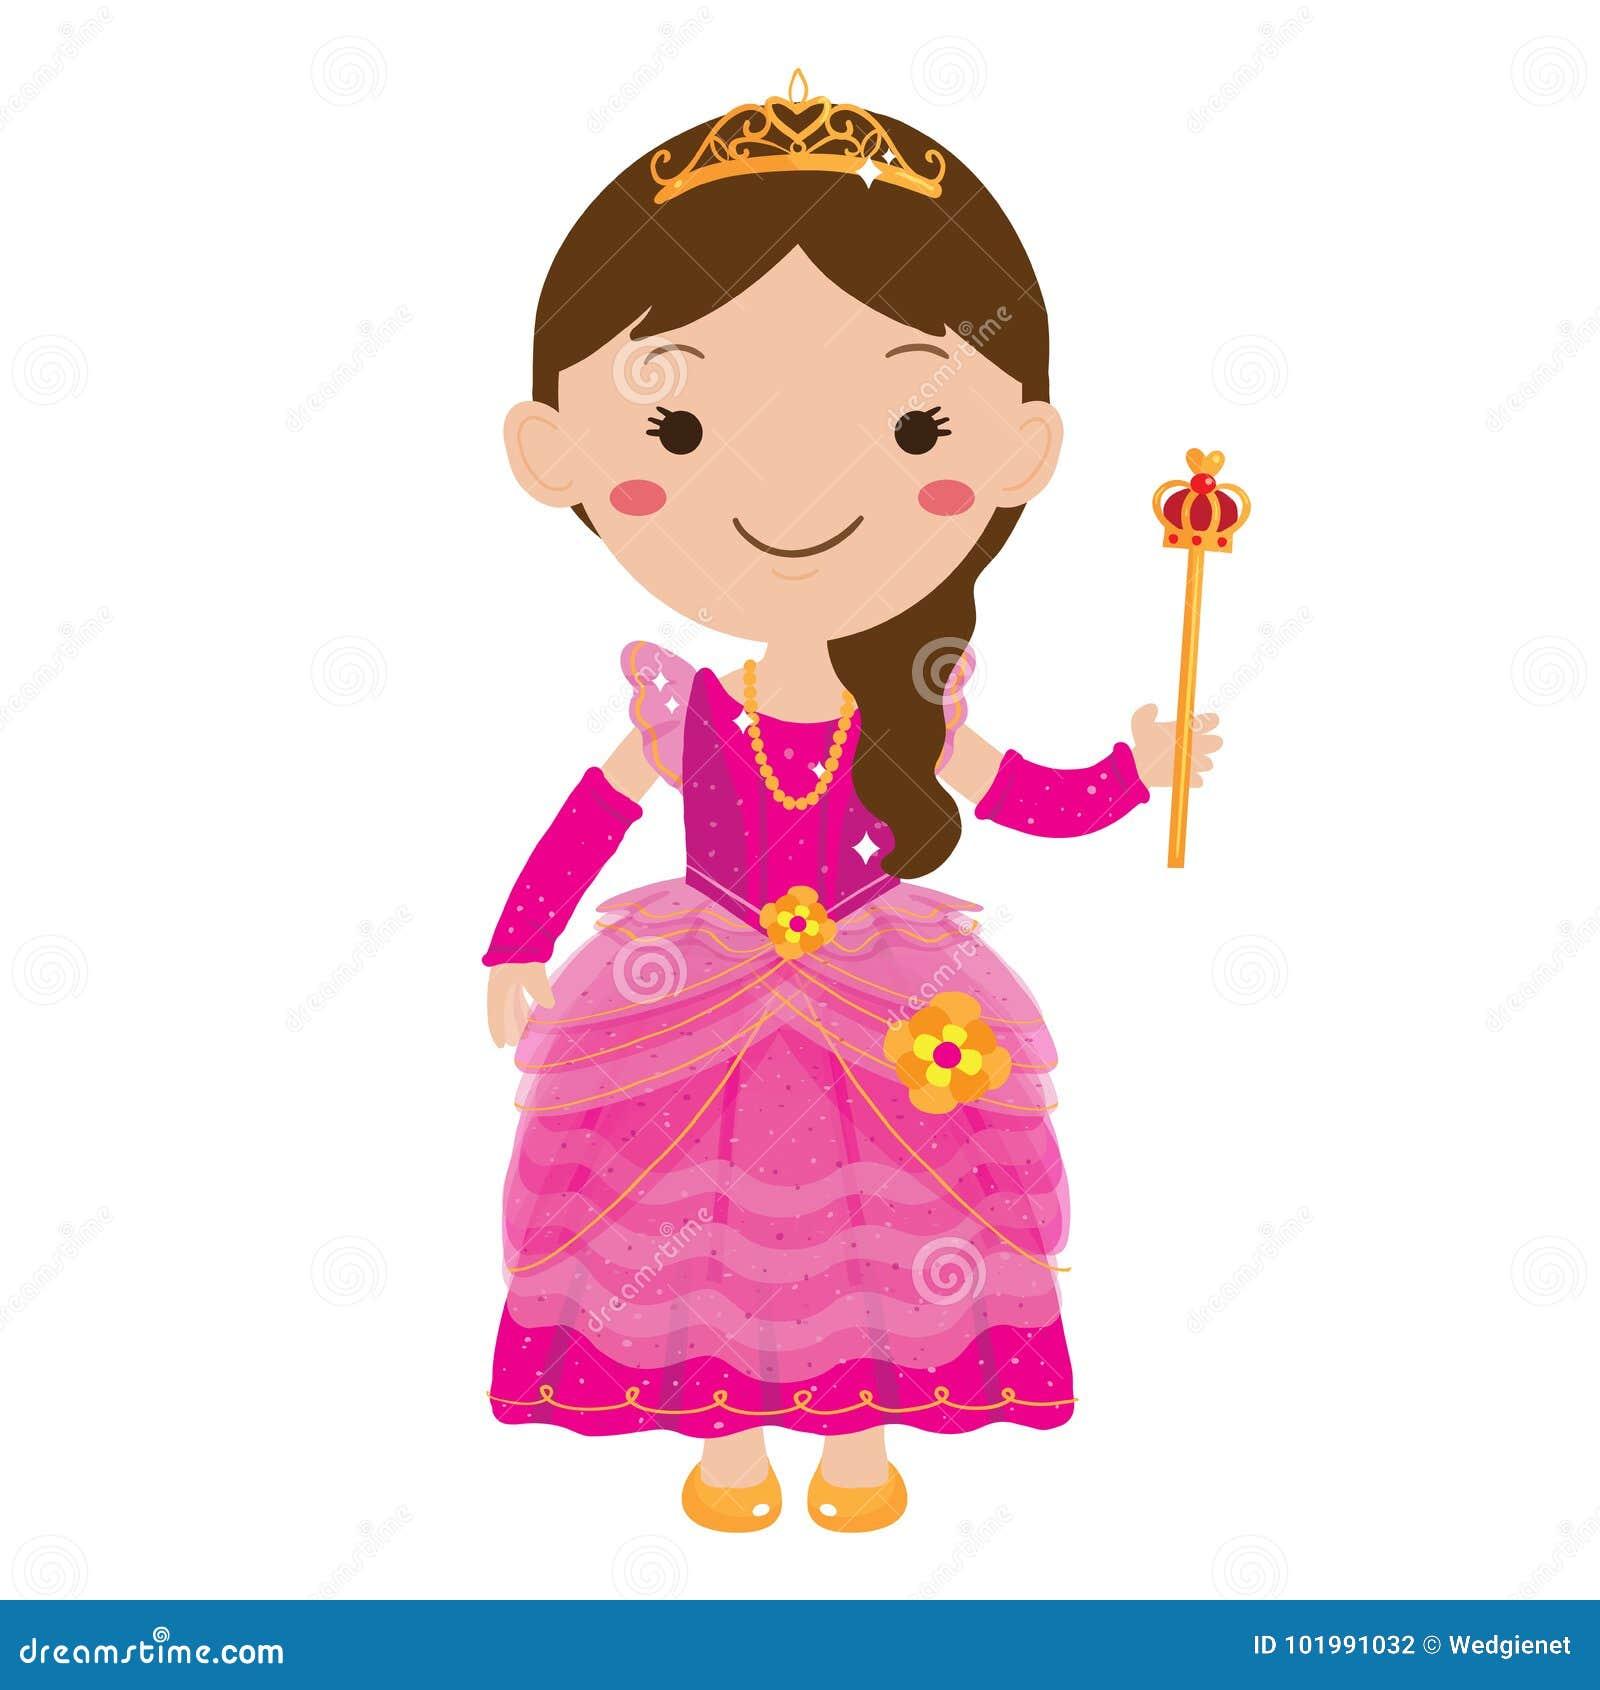 Vector illustration of young girl wearing pink princess dress